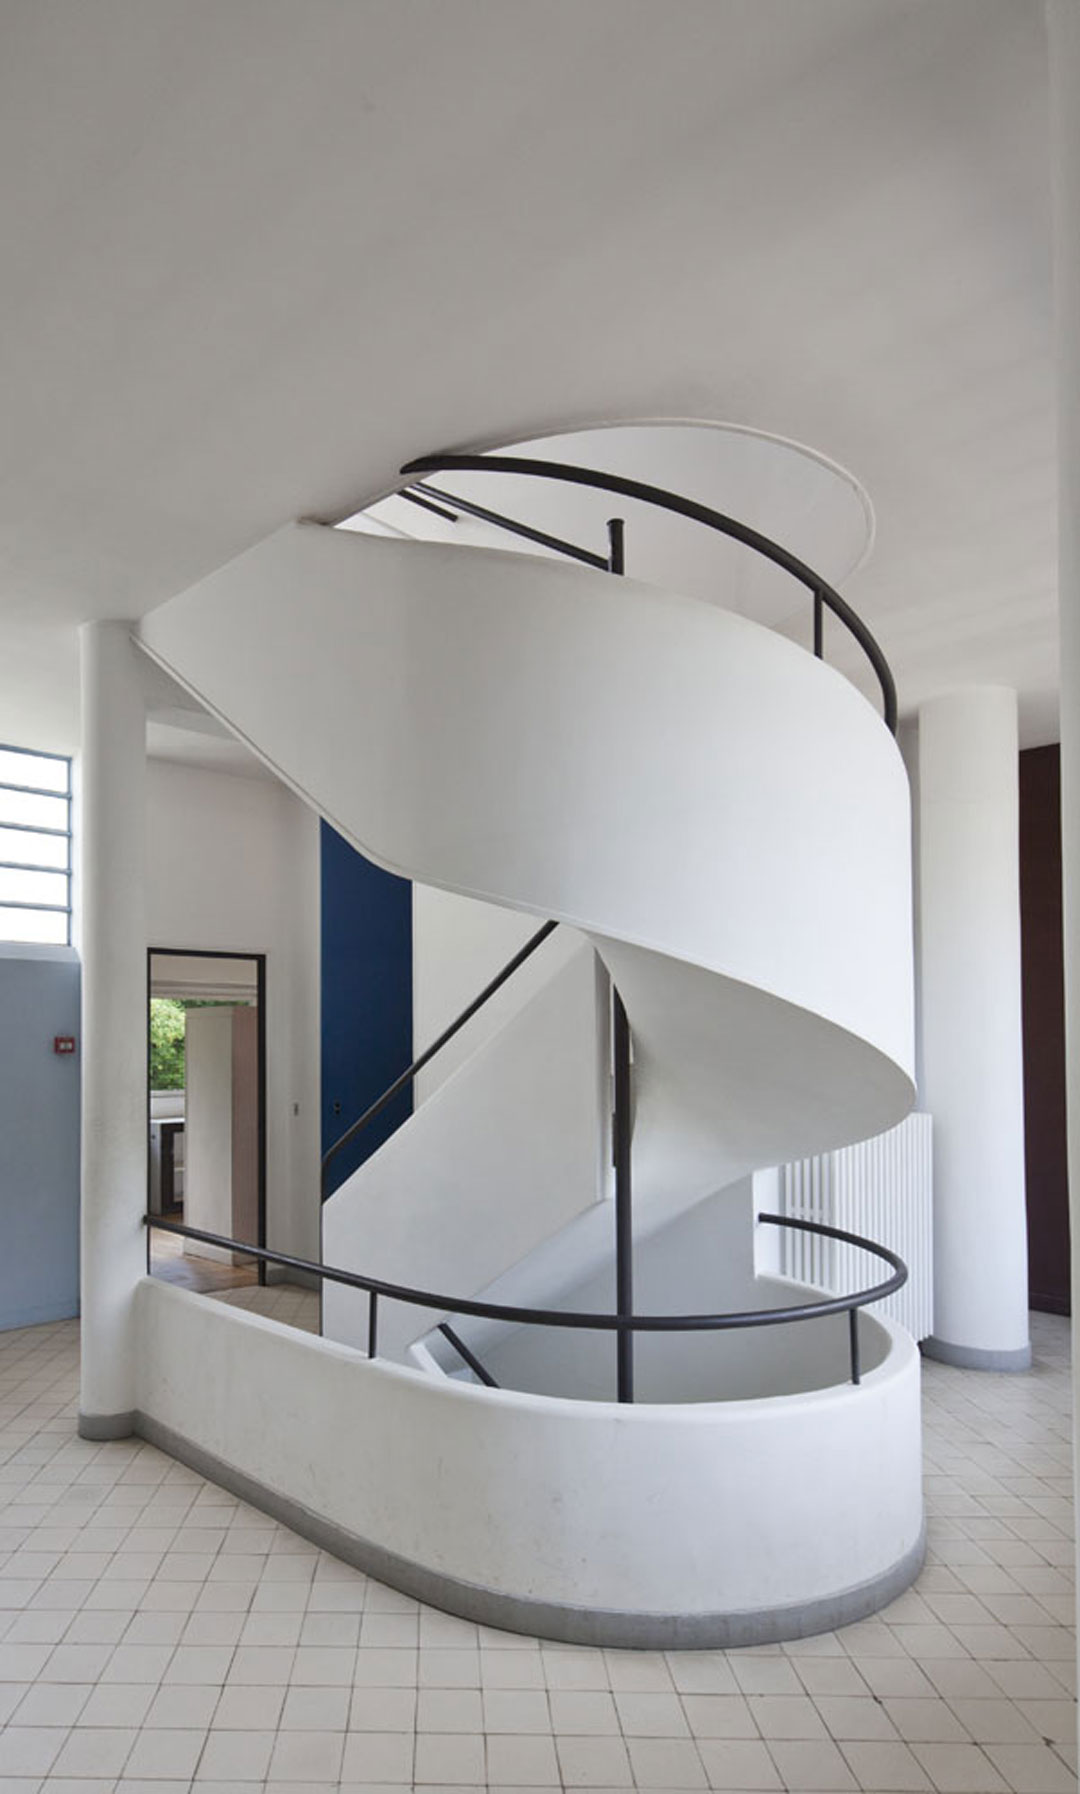 Corbusier France Savoye Le 1928 Poissy Villa